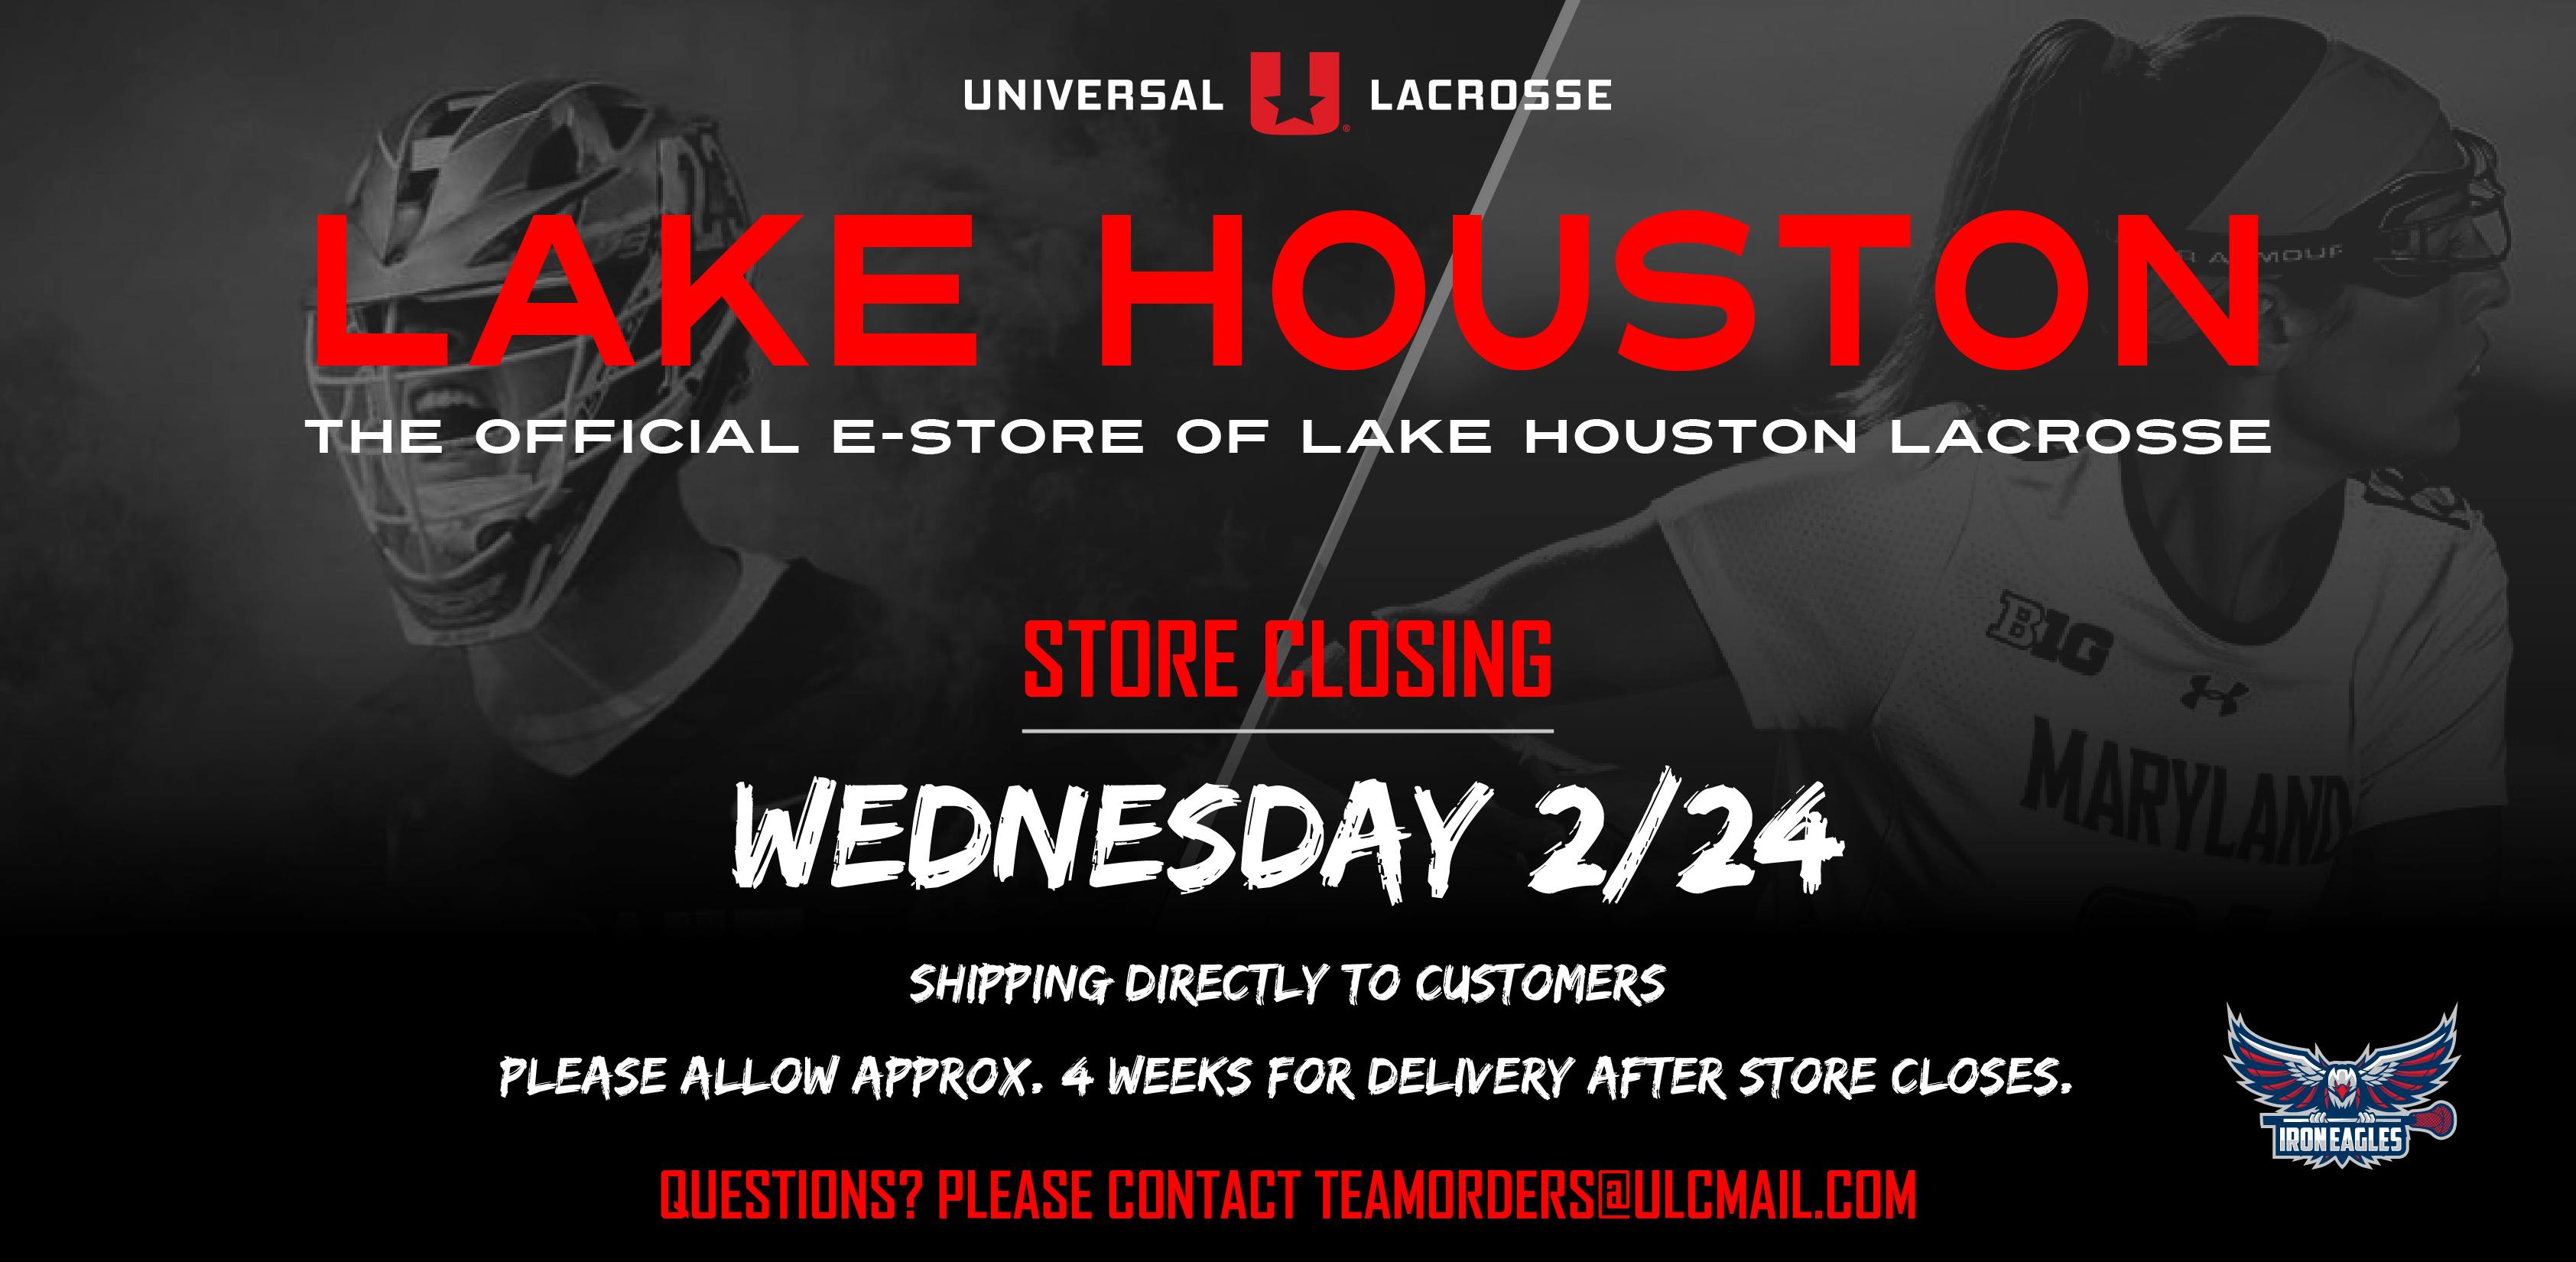 Lake Houston Lacrosse